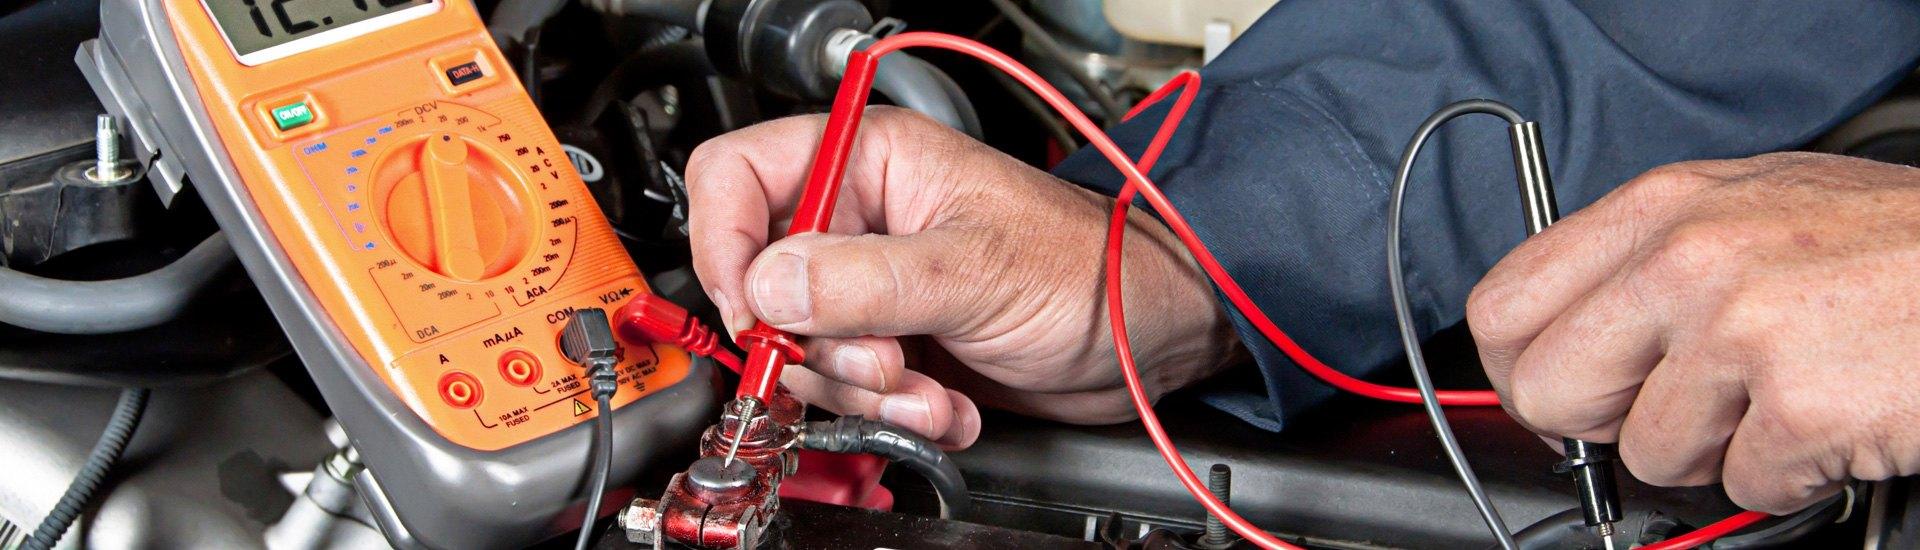 Digital Multimeter Basics 12v Dc Heavy Duty Auto Car Circuit Tester Test Light Checks Fuse